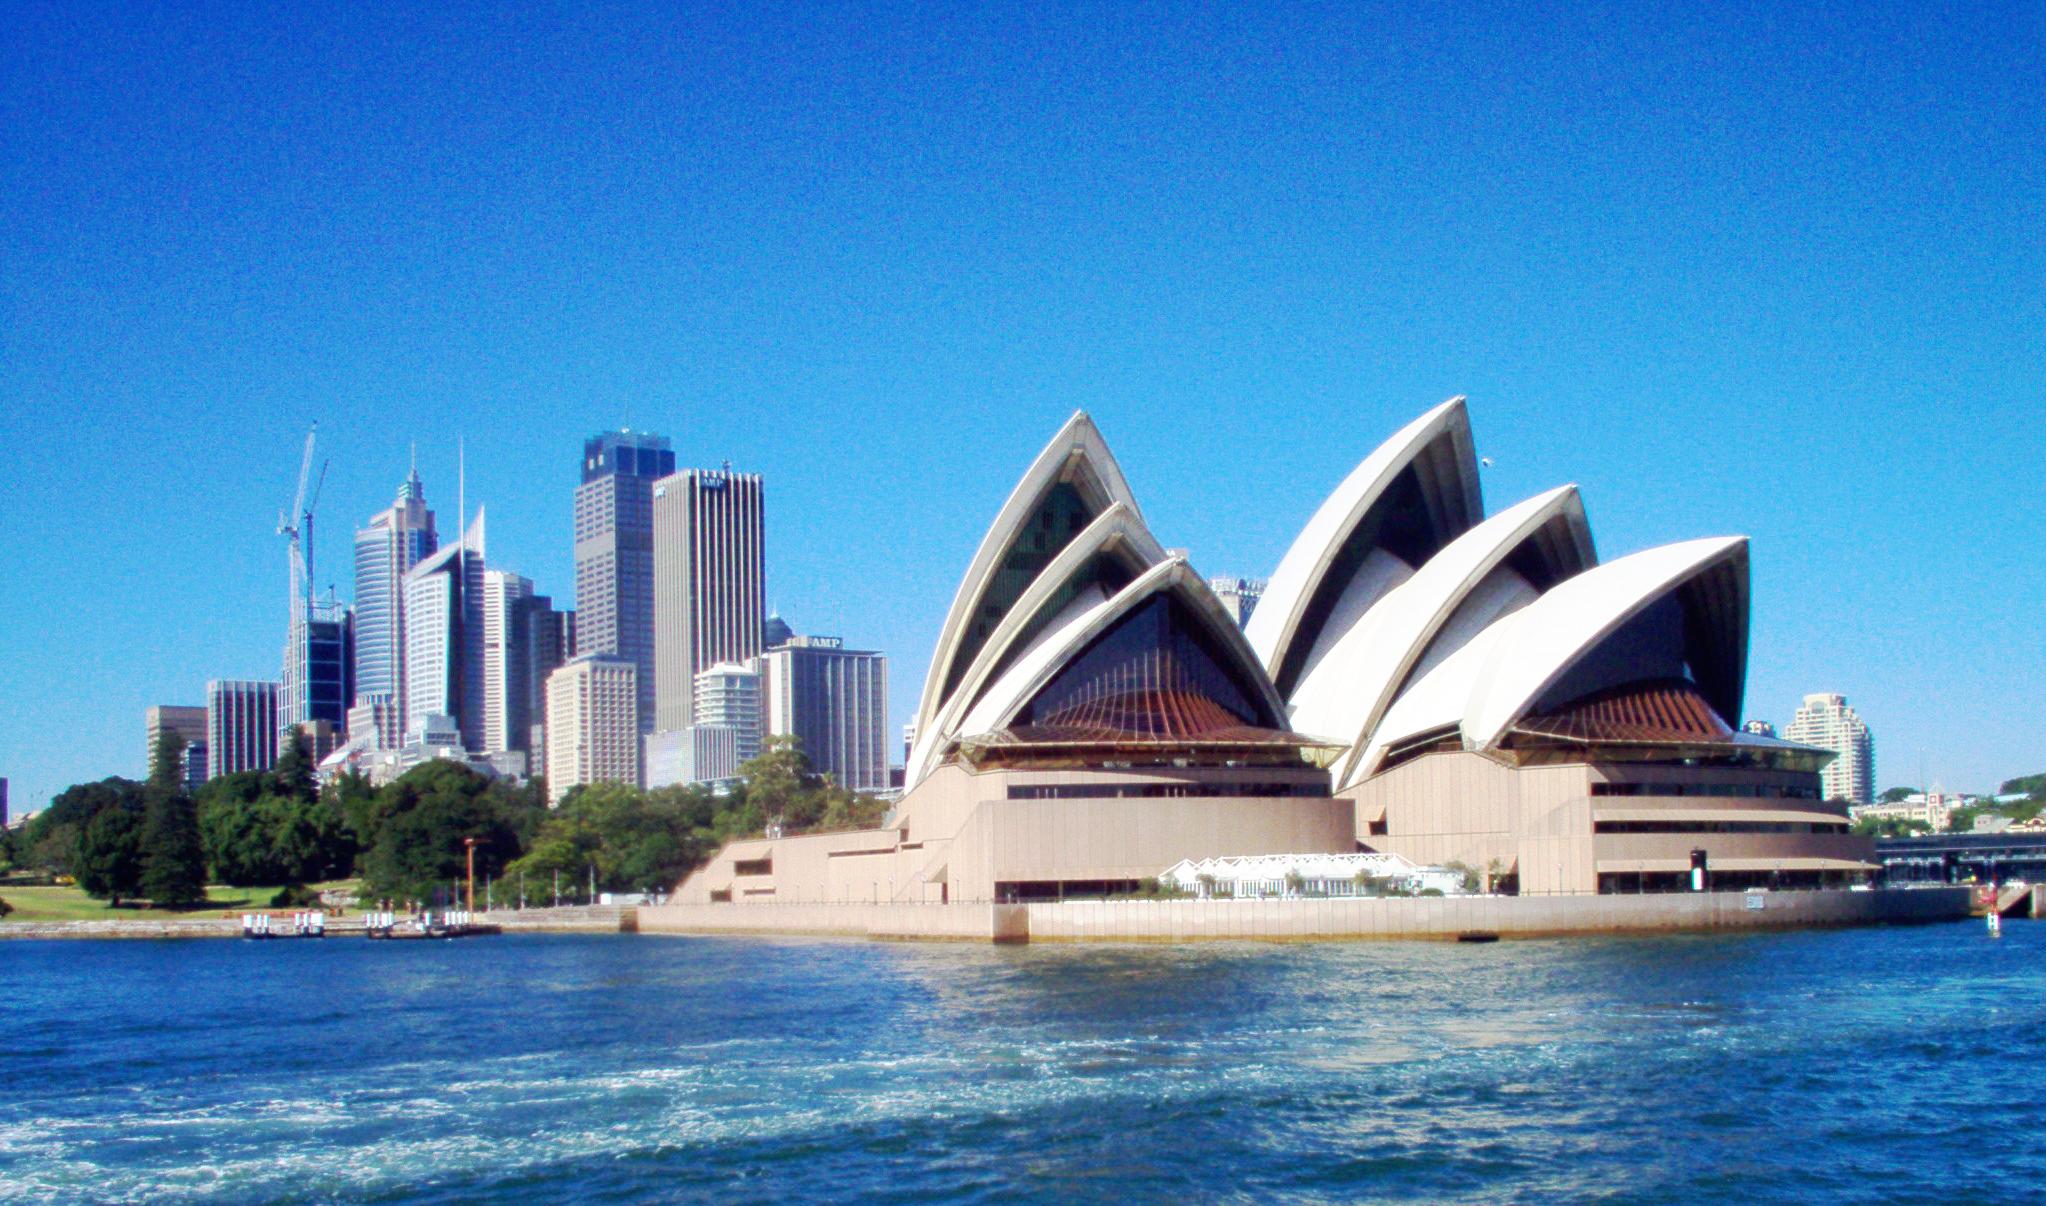 Sydney Opera House Top Wallpaper   Travel HD Wallpapers 2046x1206